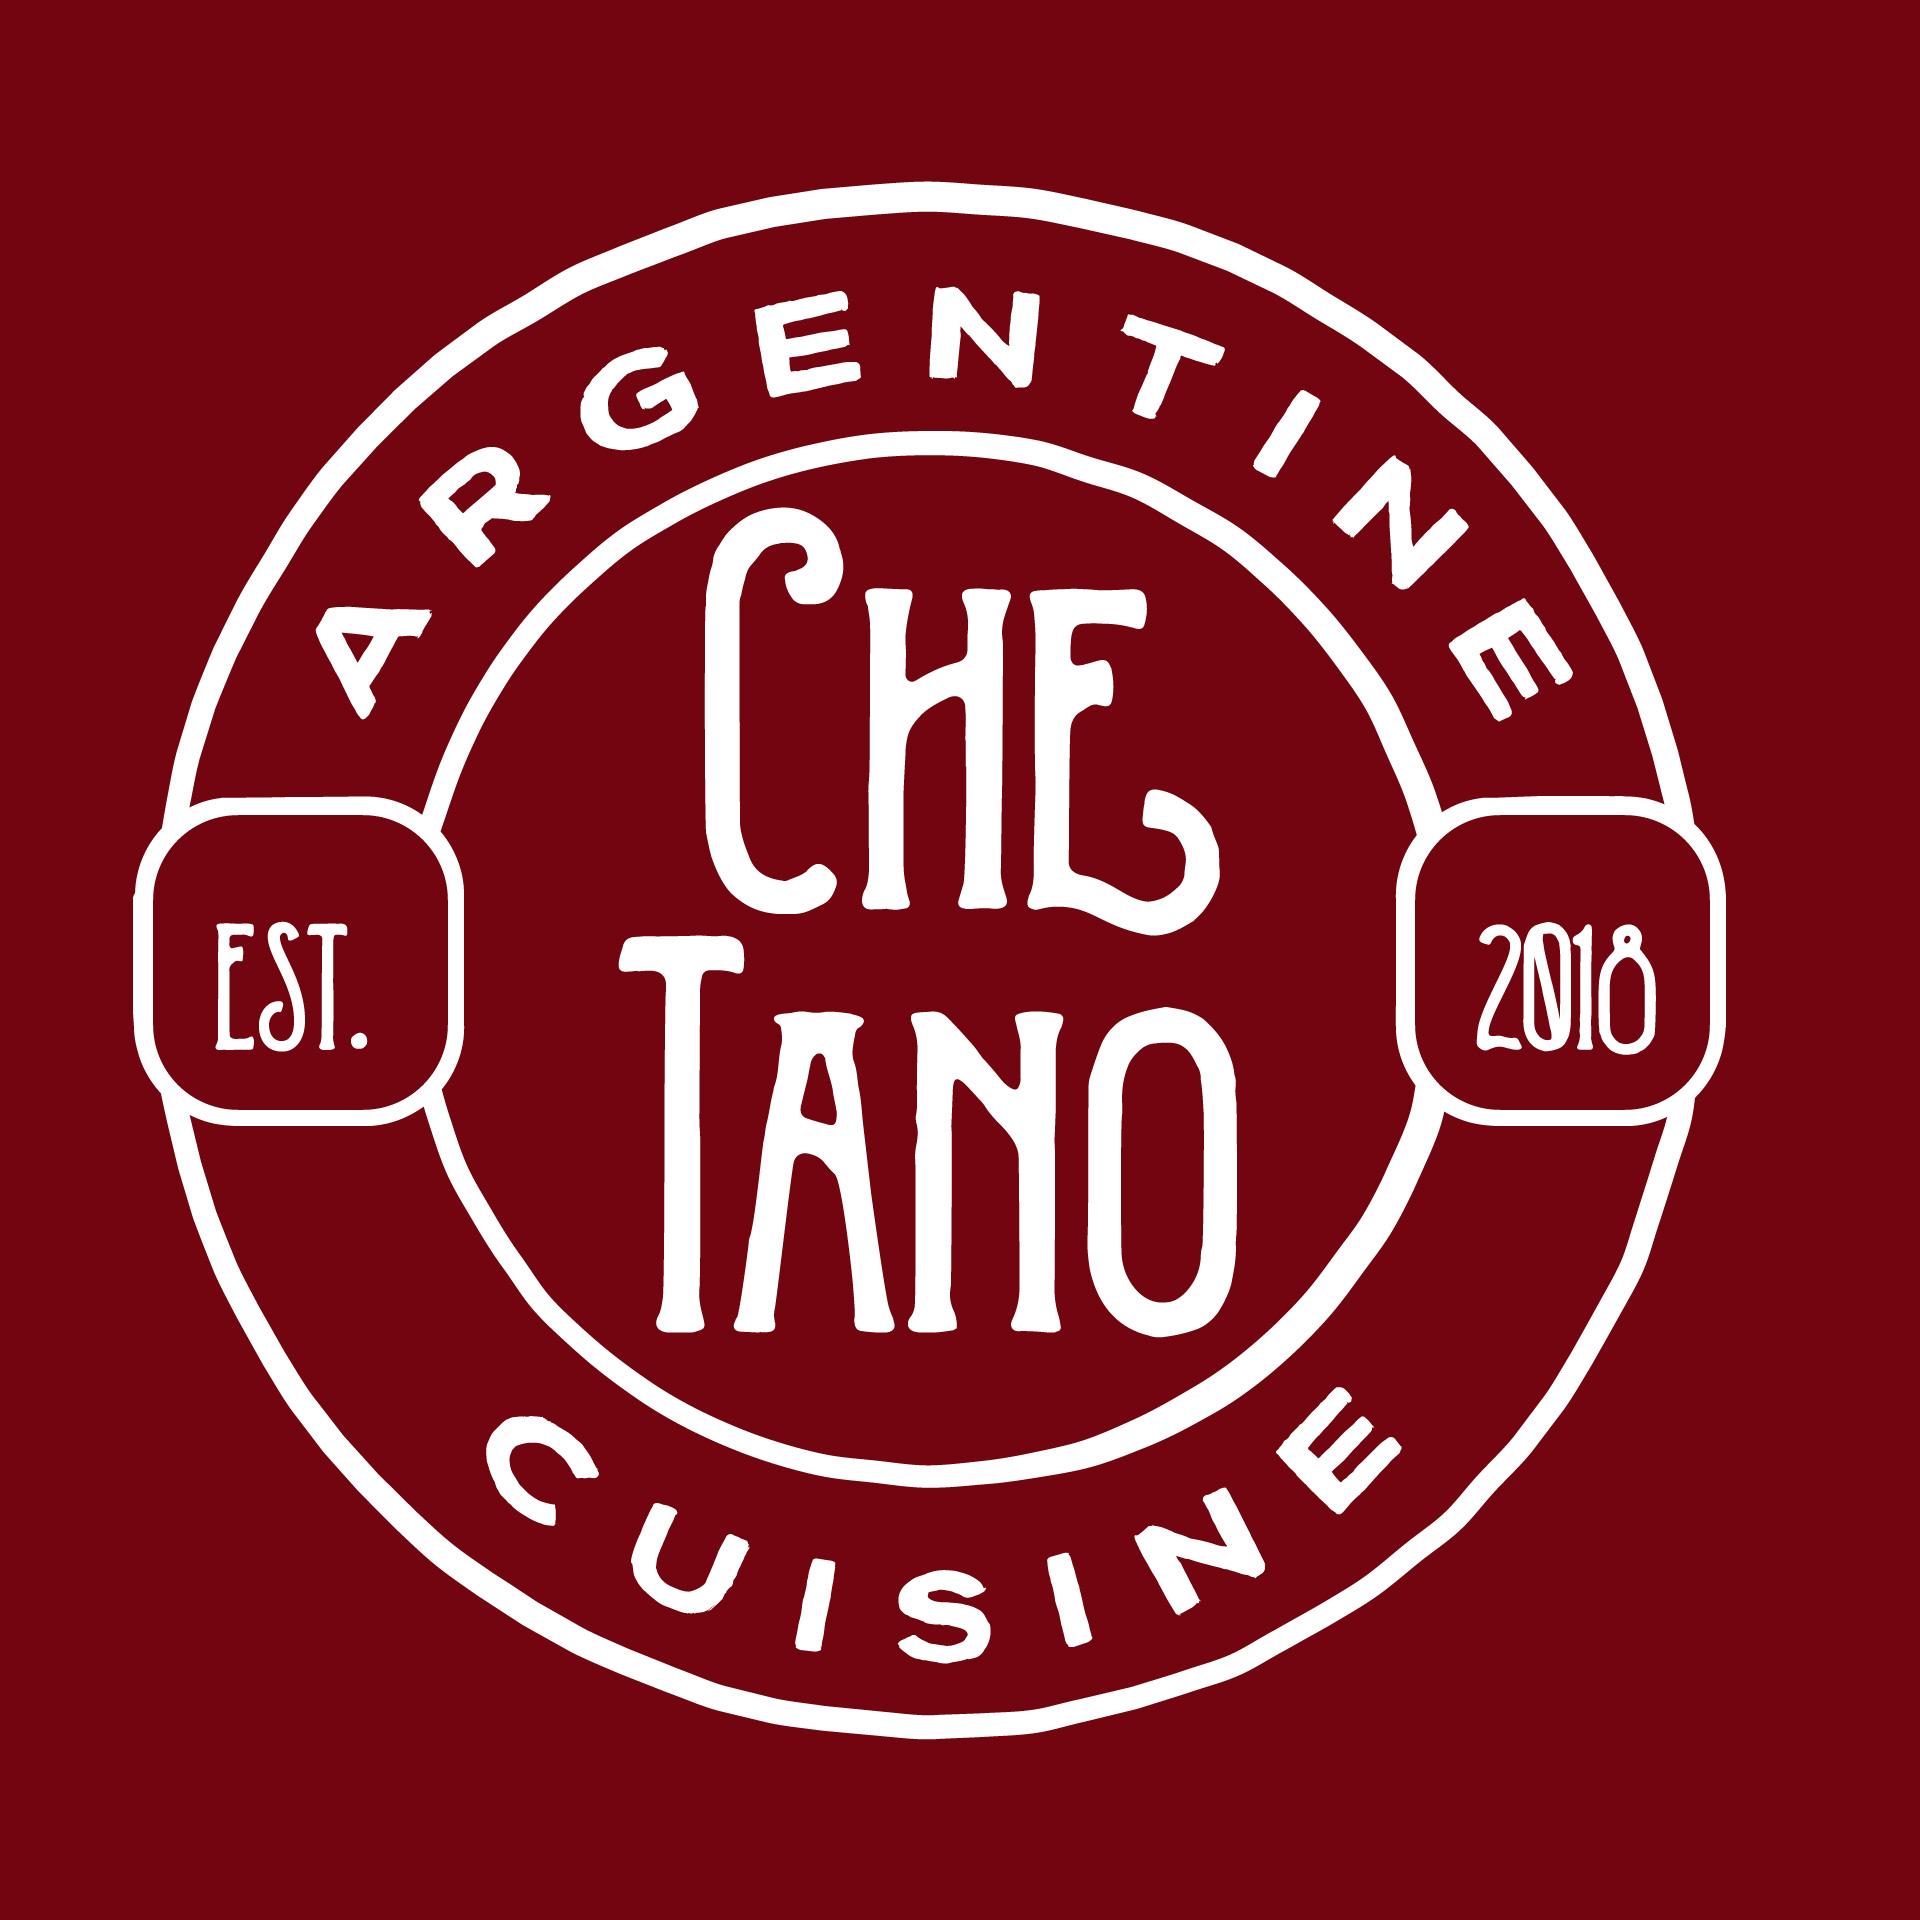 CheTano_logo.jpg